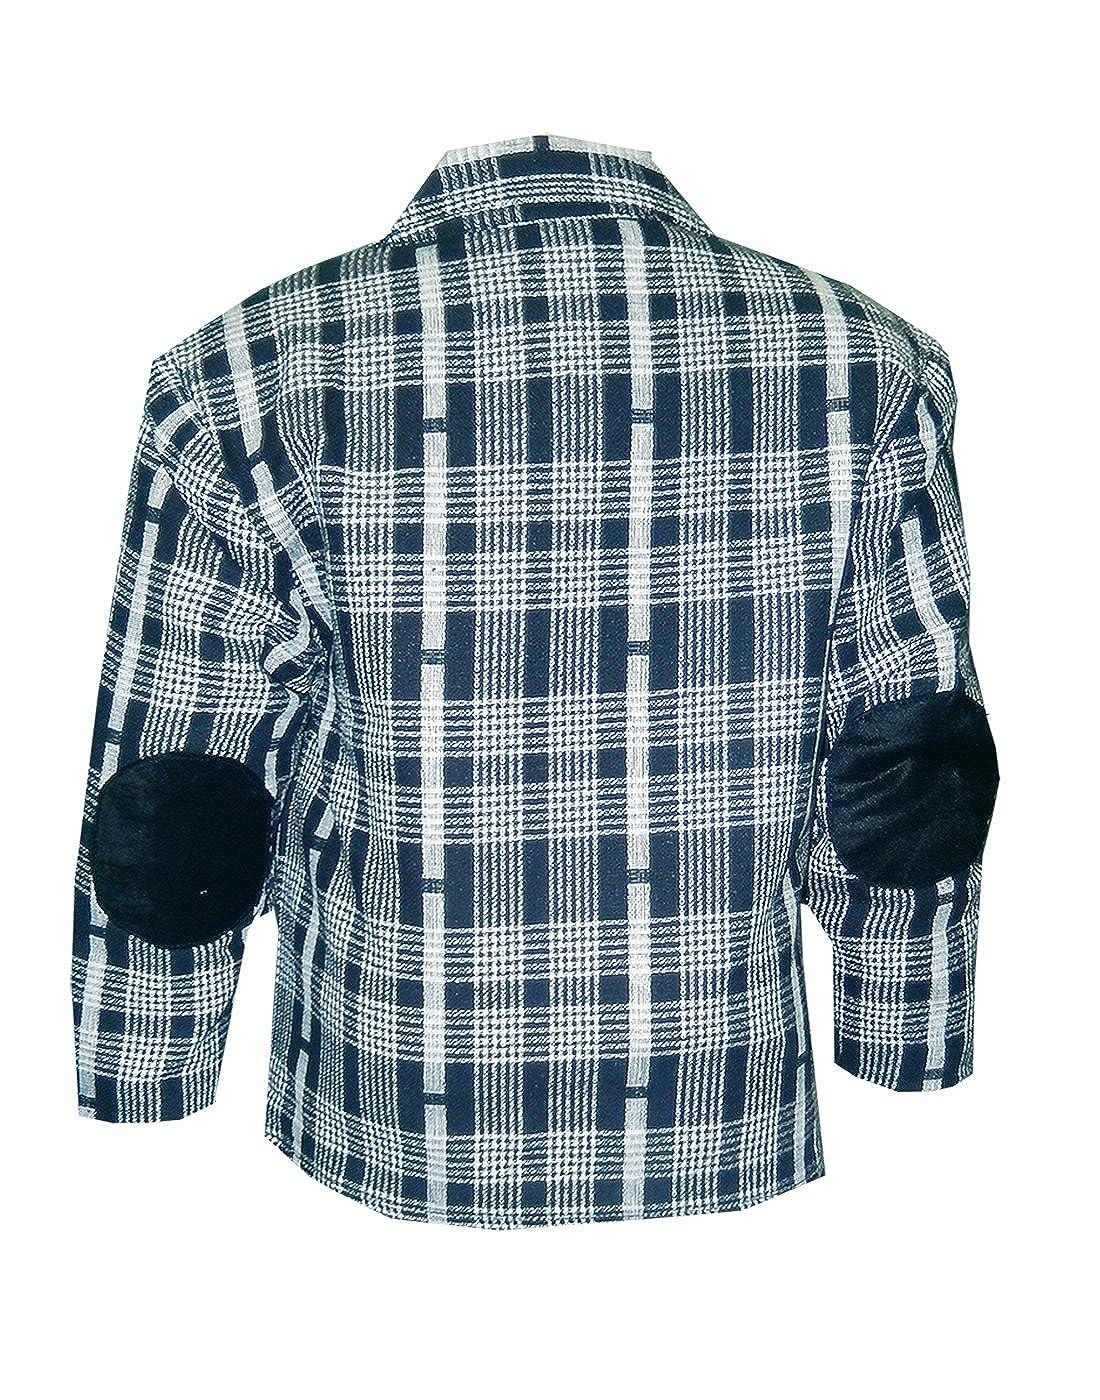 b34142600d KOOKA KIDS Boys Full Sleeves Blazer with Half Sleeves Round Neck T-Shirt  (2PC) Set (CS-27-10-Years-Black)  Amazon.in  Clothing   Accessories